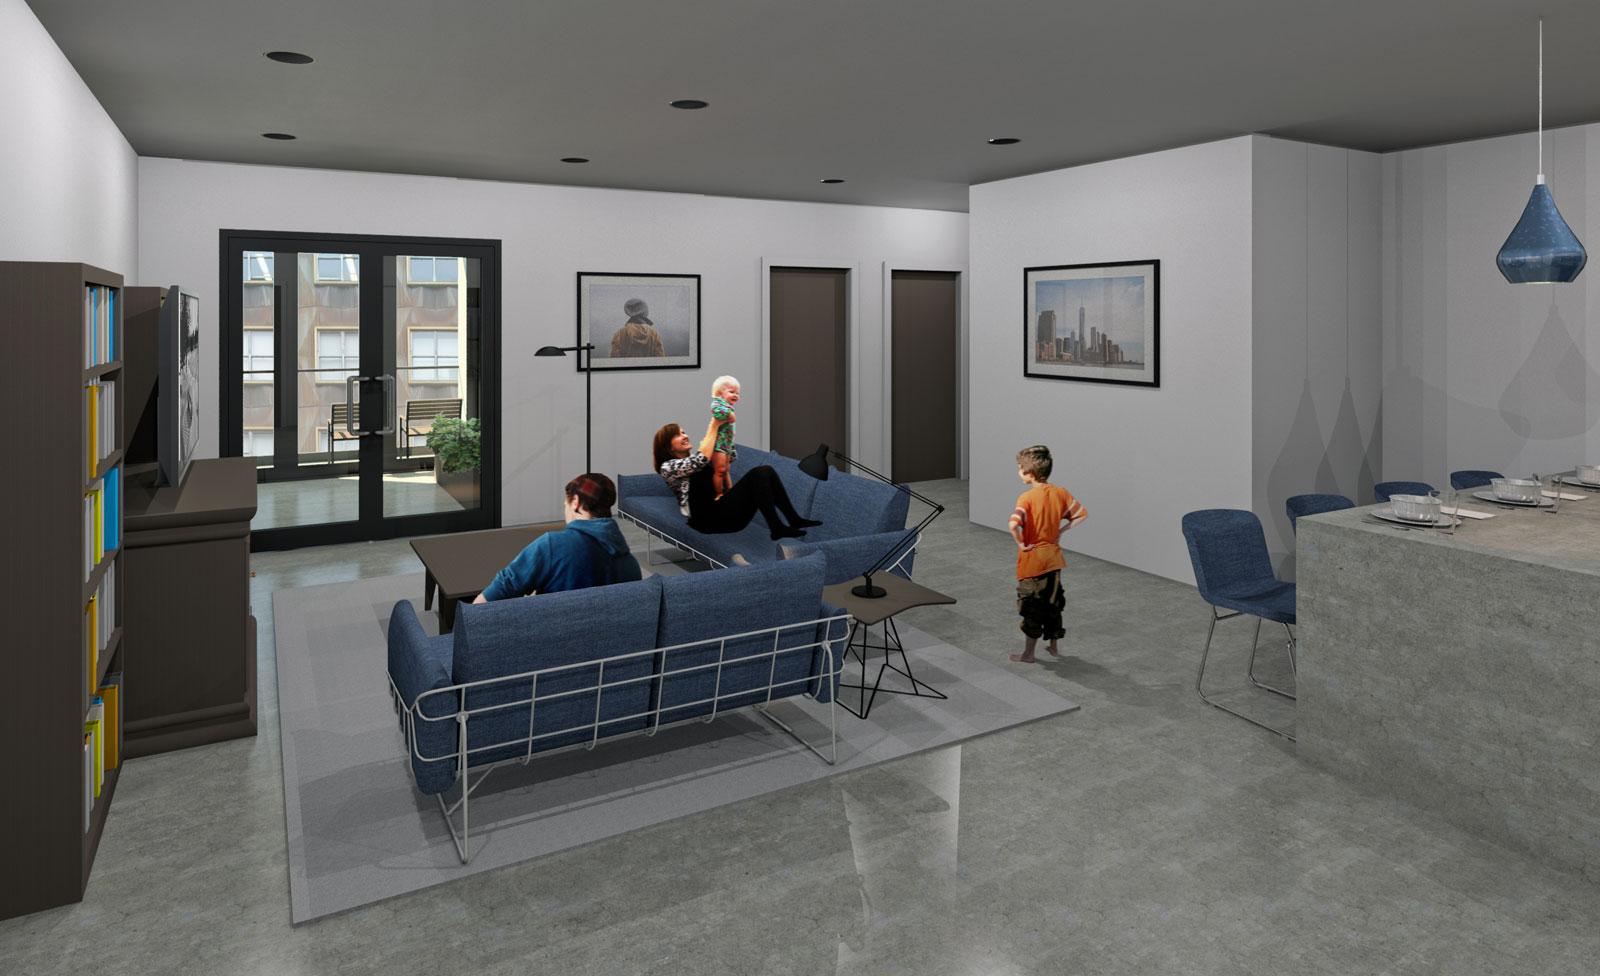 2 Bedroom Interior Final